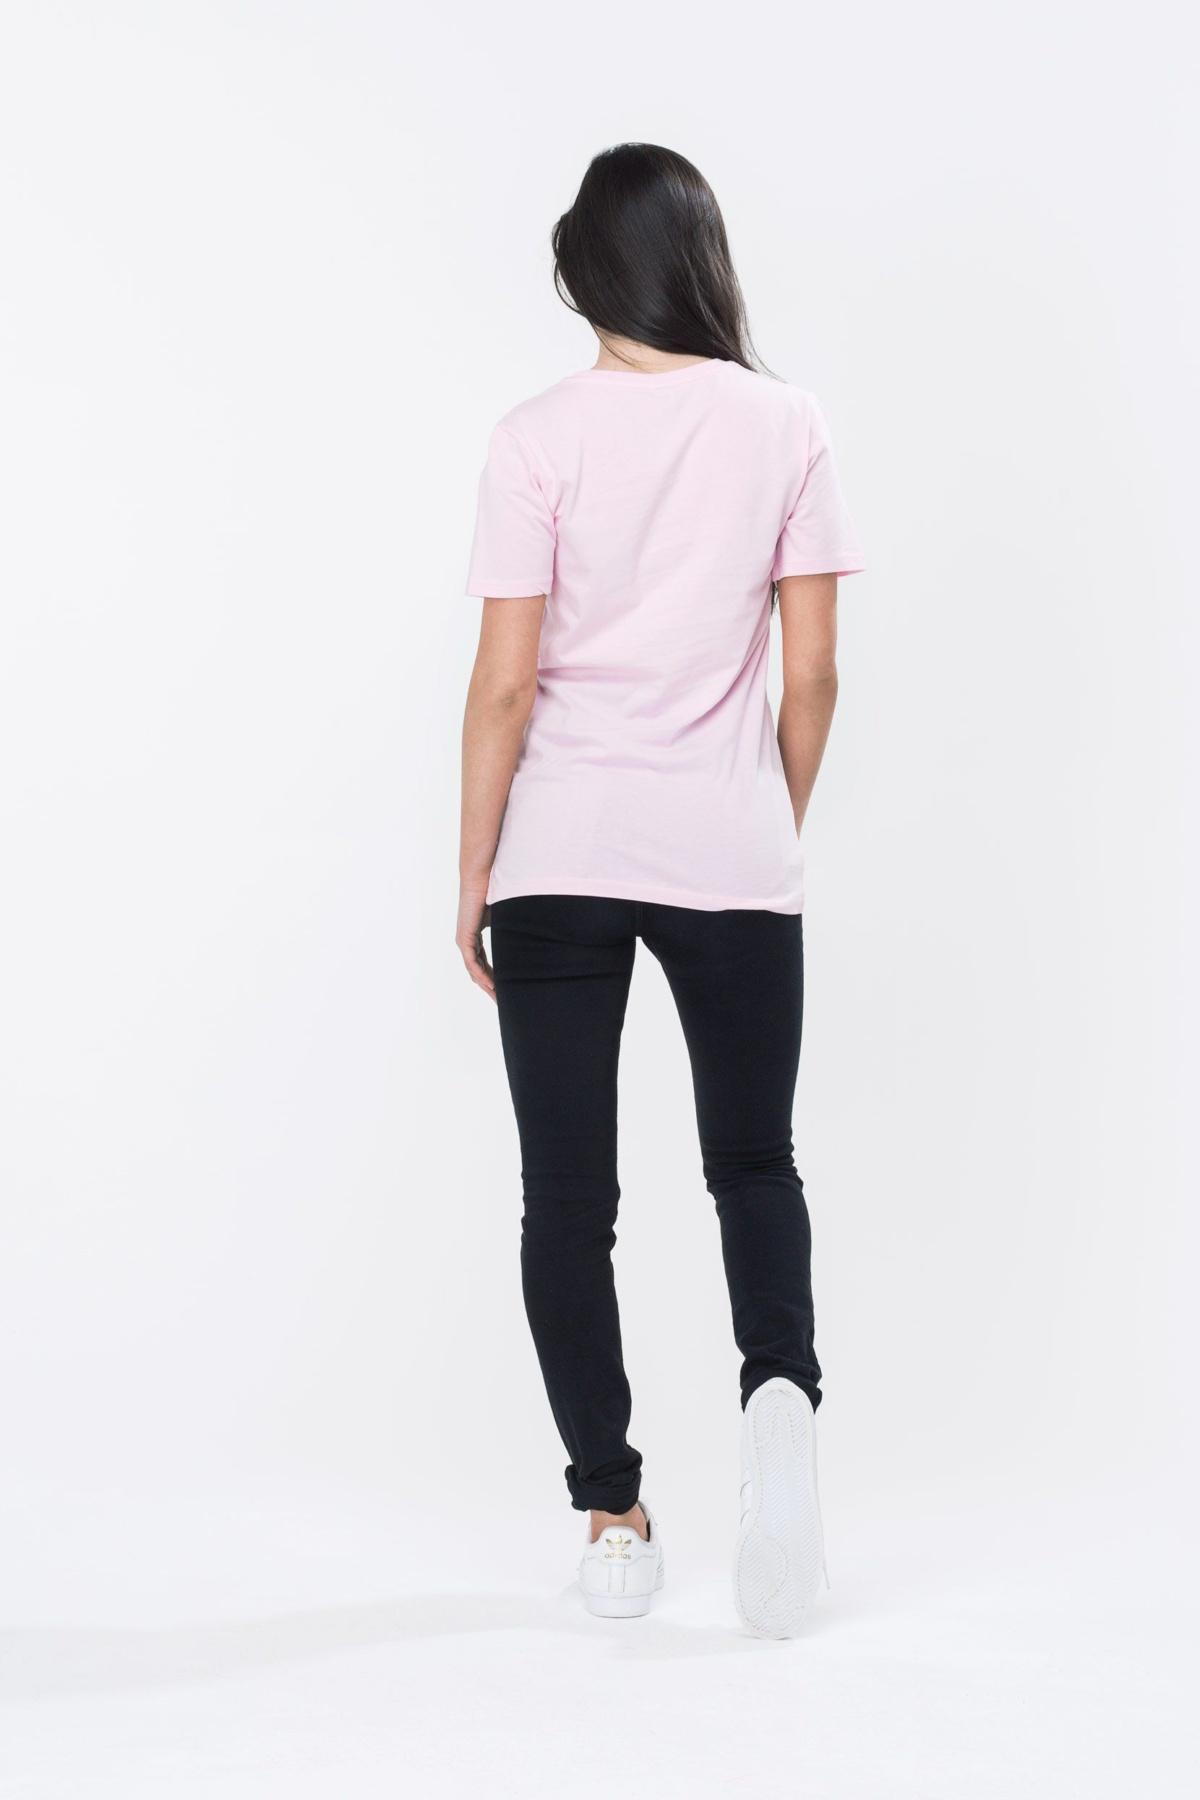 HYPE Pink/White Hype Script Women's T-Shirt